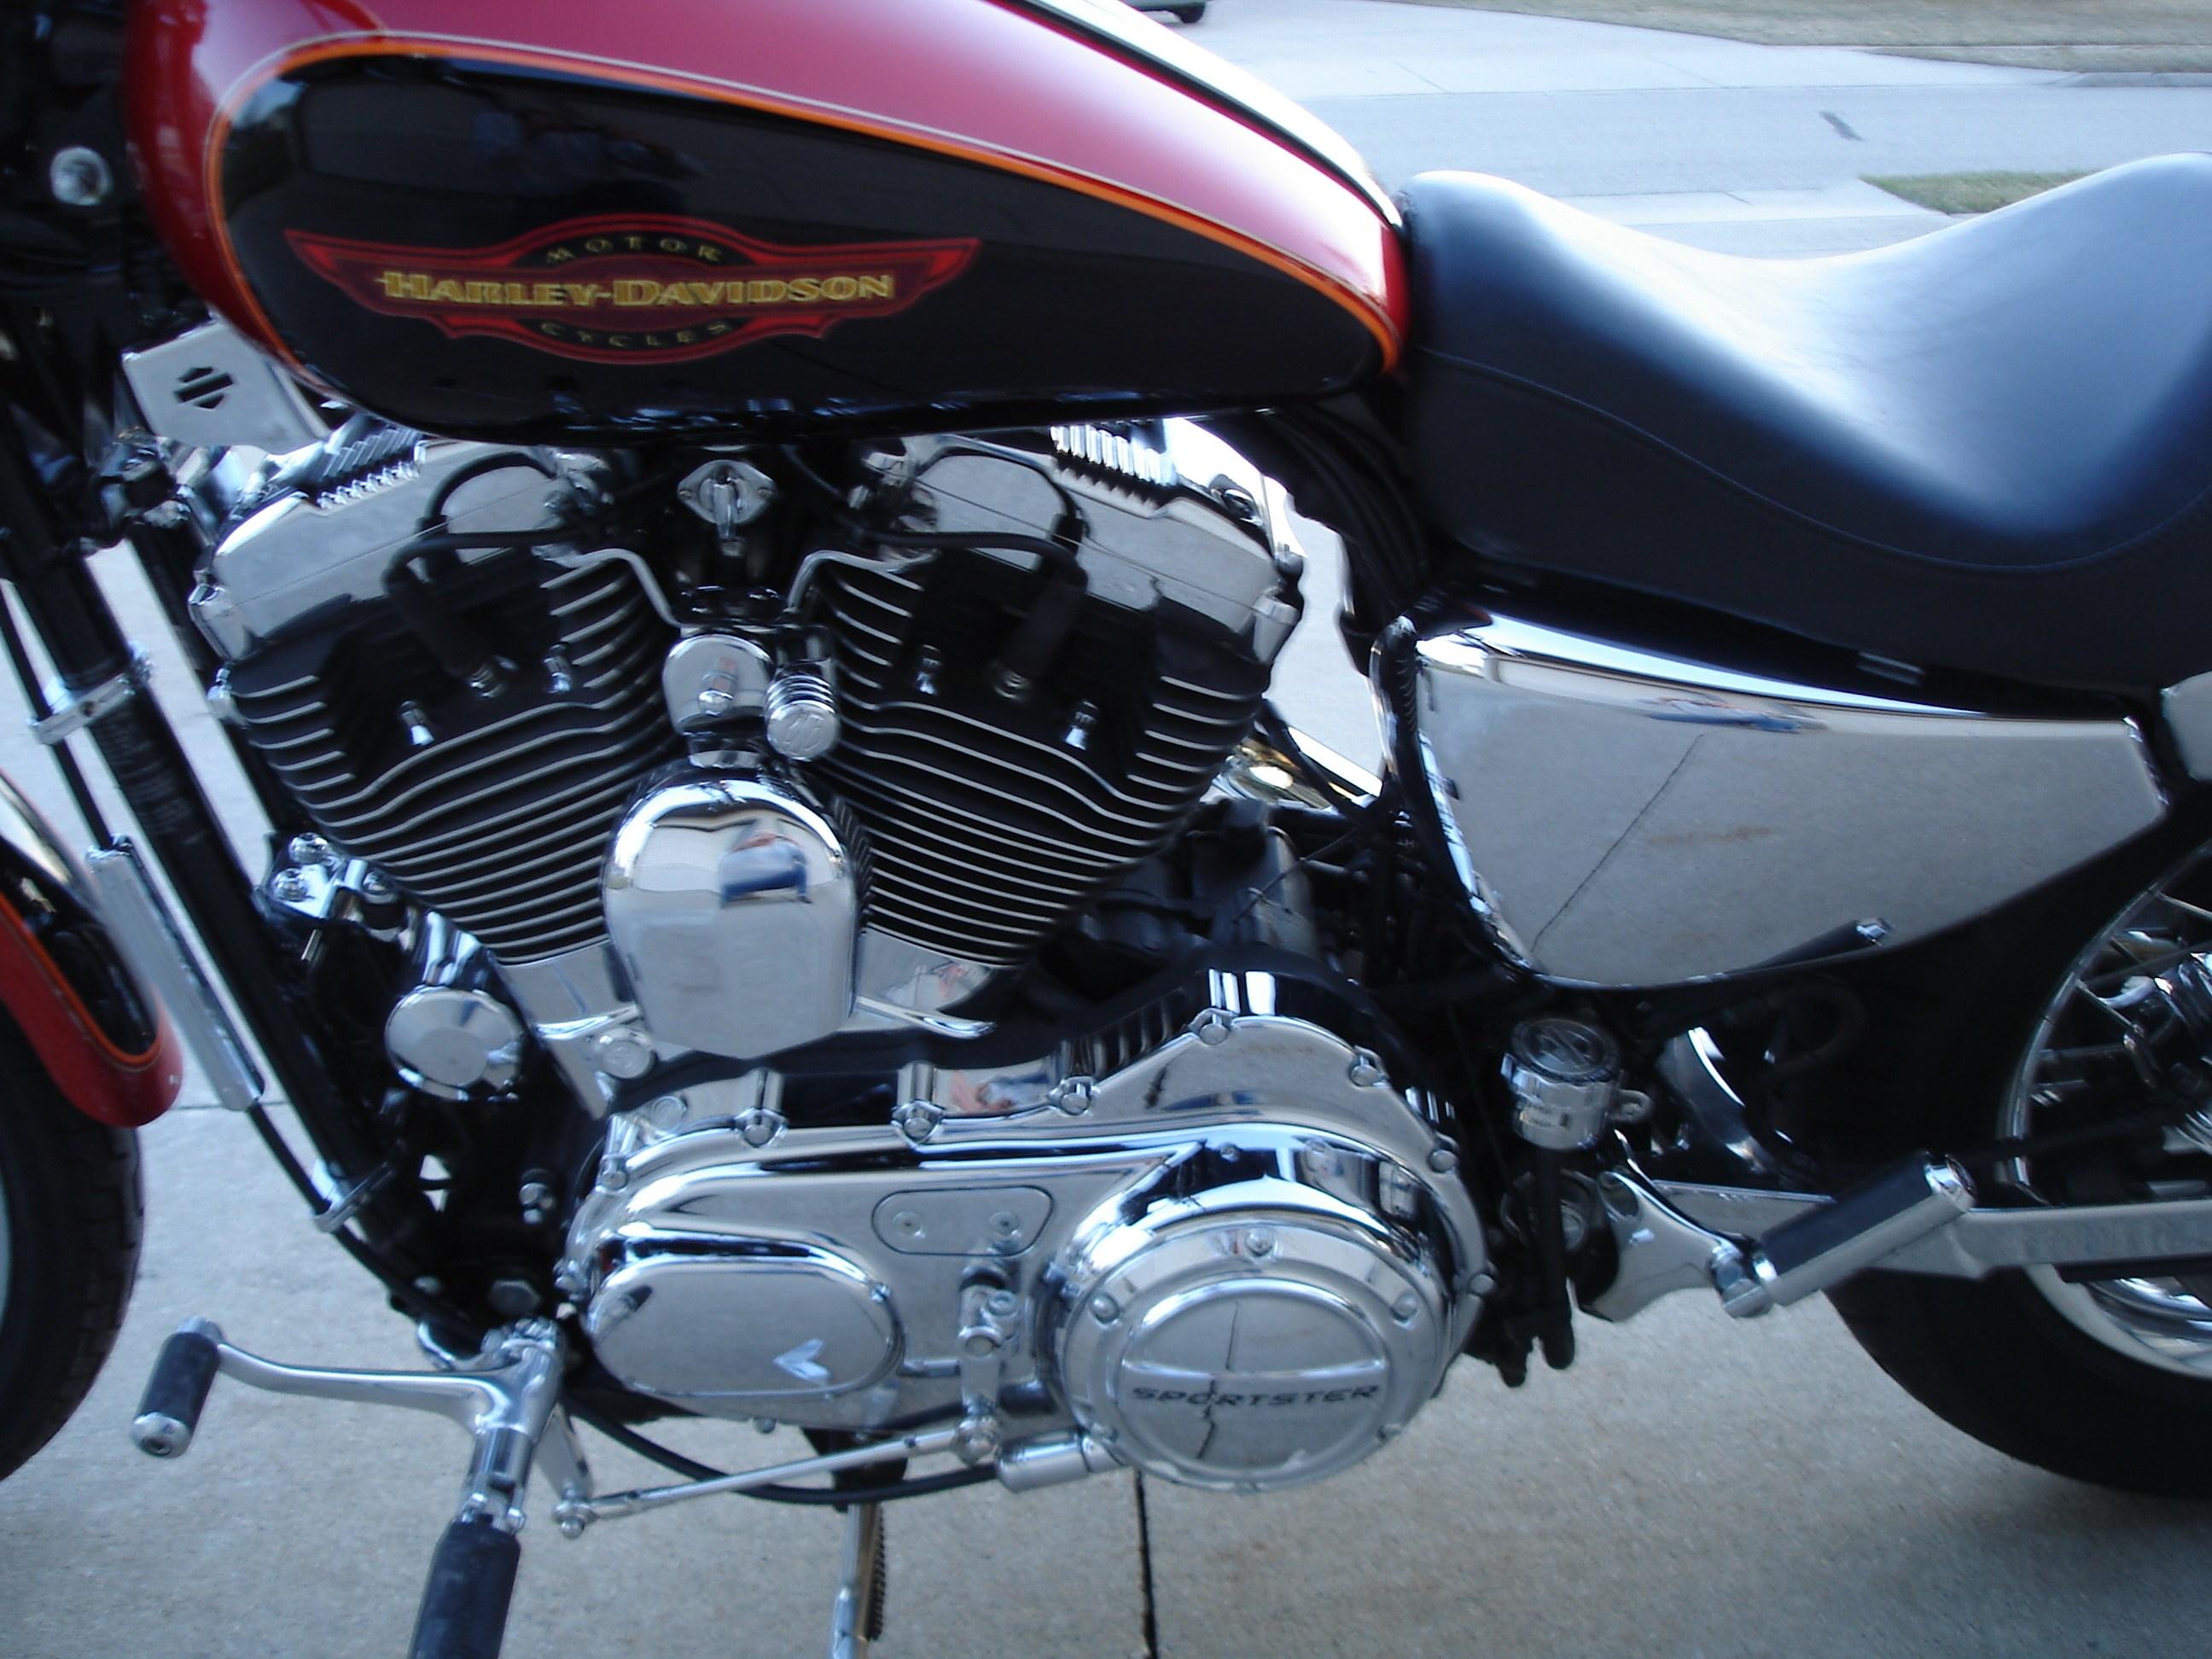 Motorcycle Dealers In Ma >> 2005 Harley-Davidson® XL1200C Sportster® 1200 Custom ...